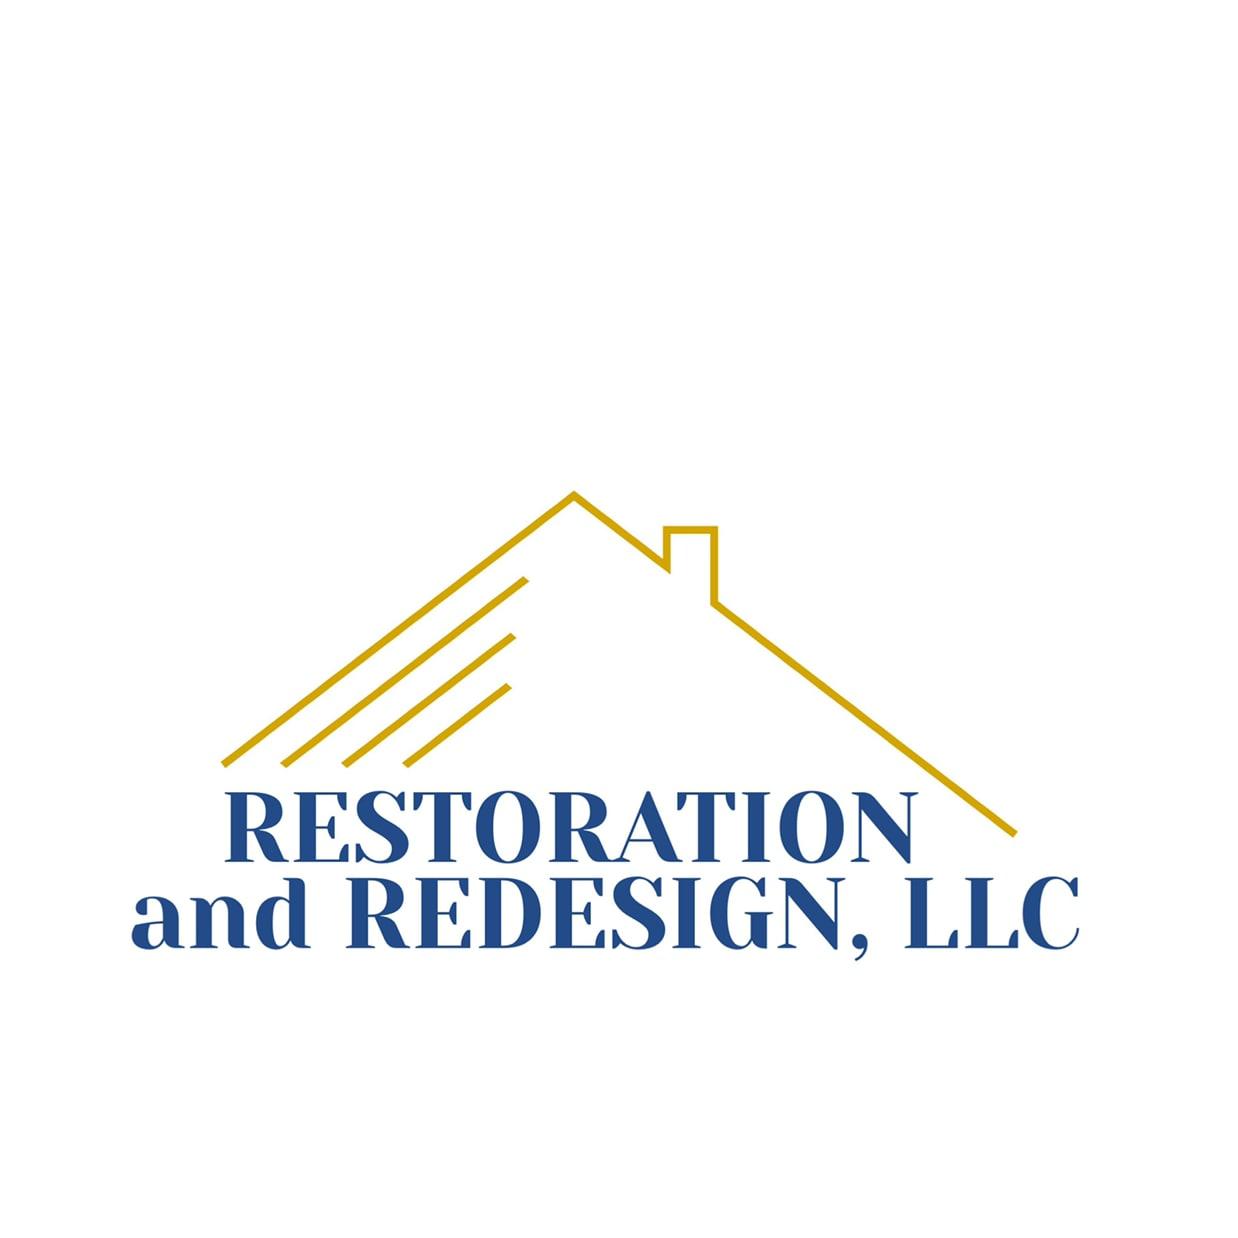 Restoration and Redesign, LLC